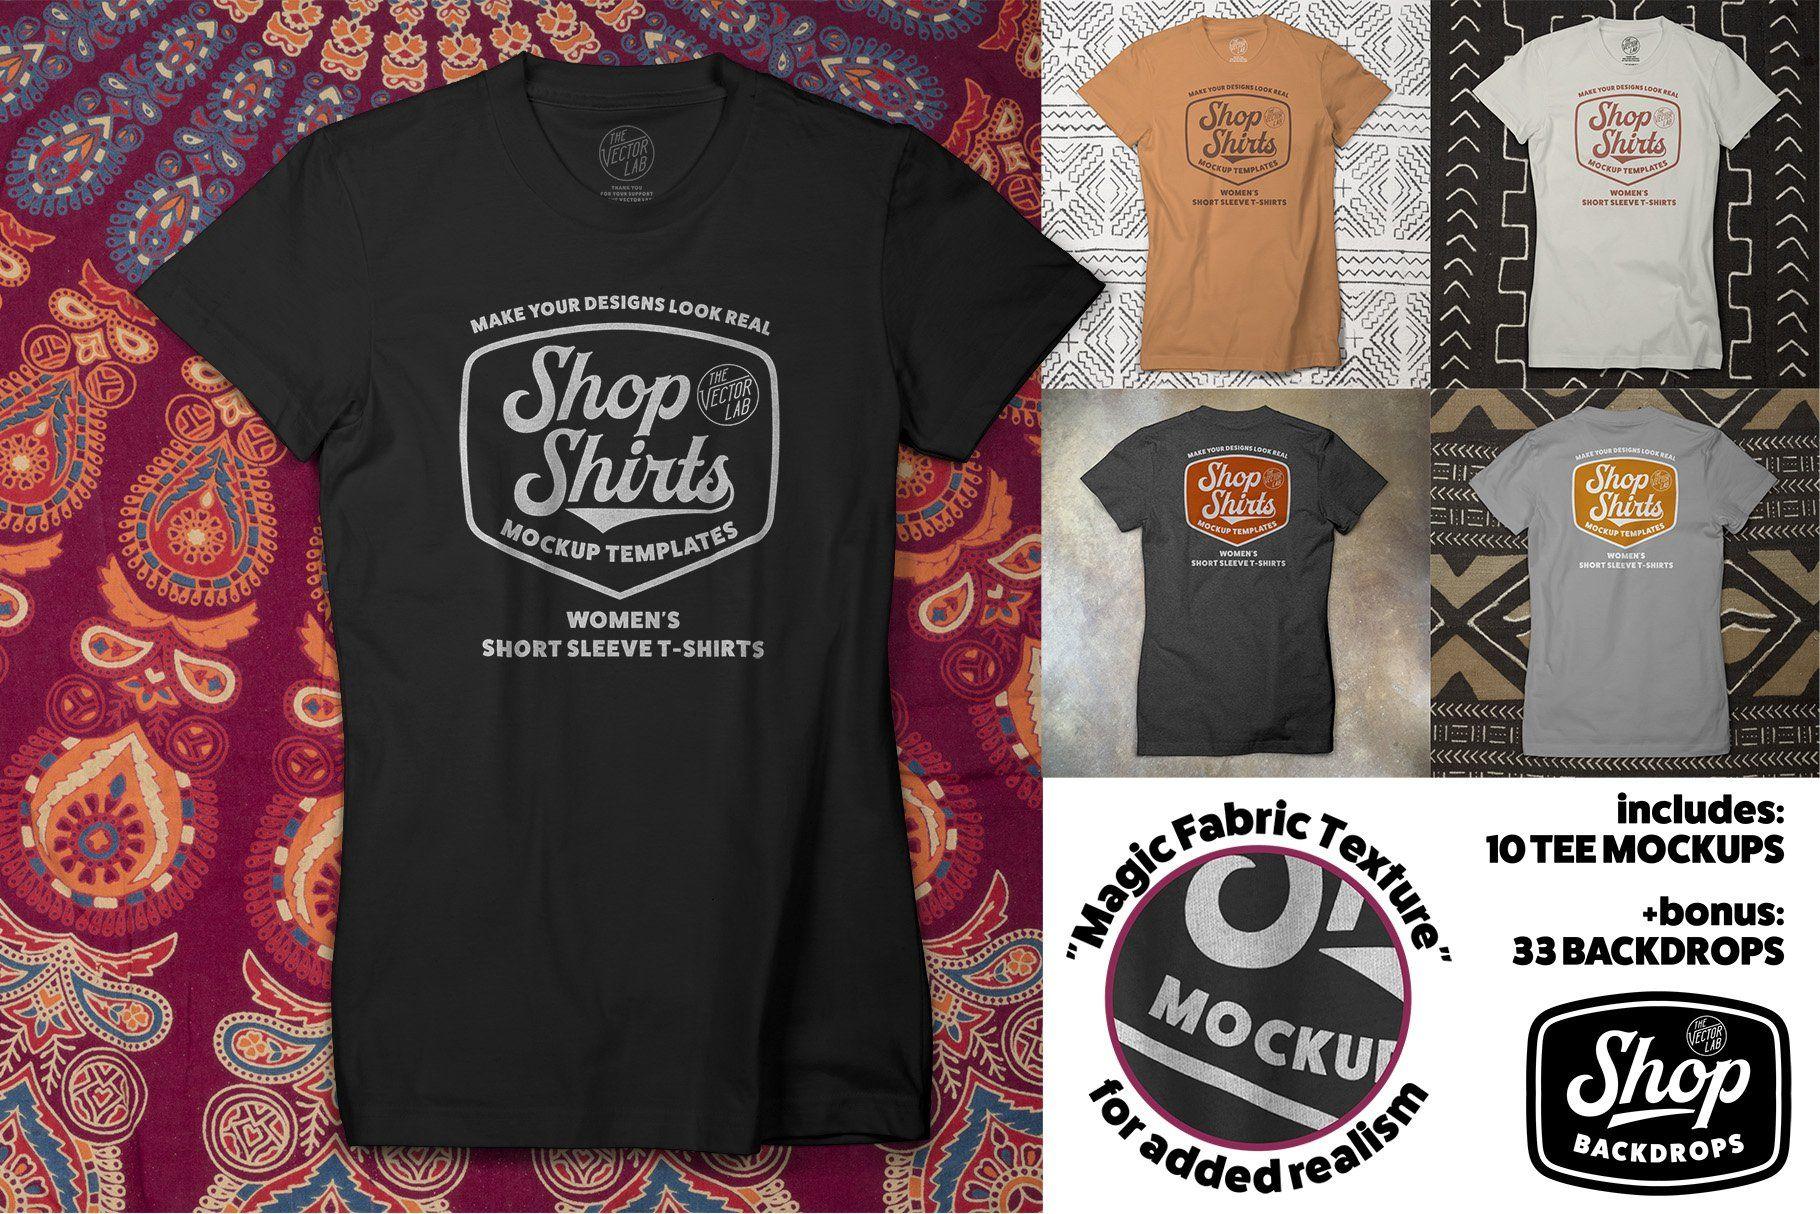 T Shirt Design Master Collection 2 Ad Custom Added Minutes Logos Ad Shirt Mockup Tshirt Designs Shirt Designs